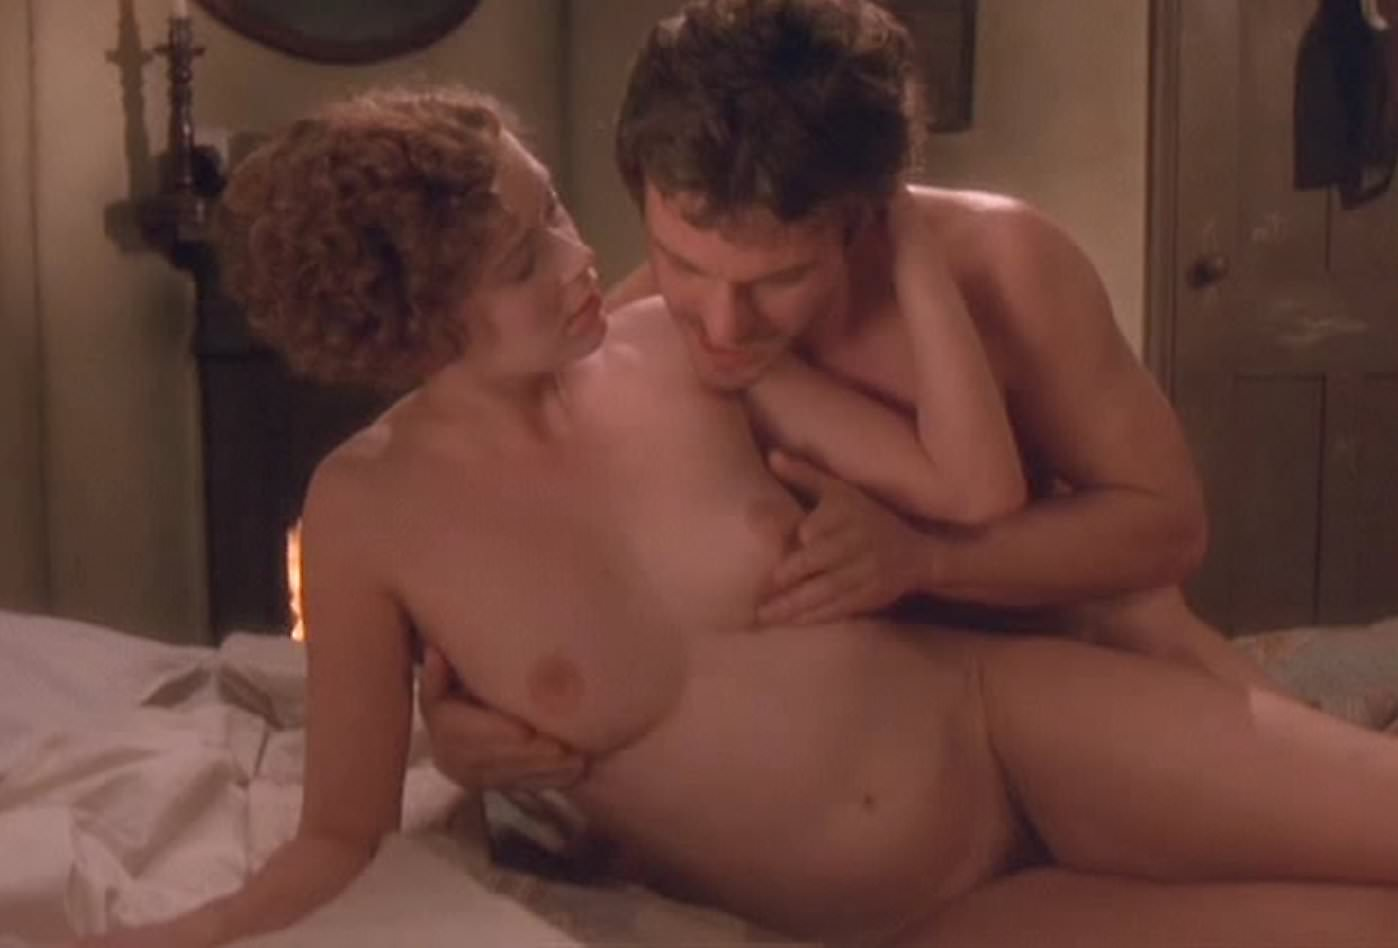 kristel nude chatterley Sylvia lady